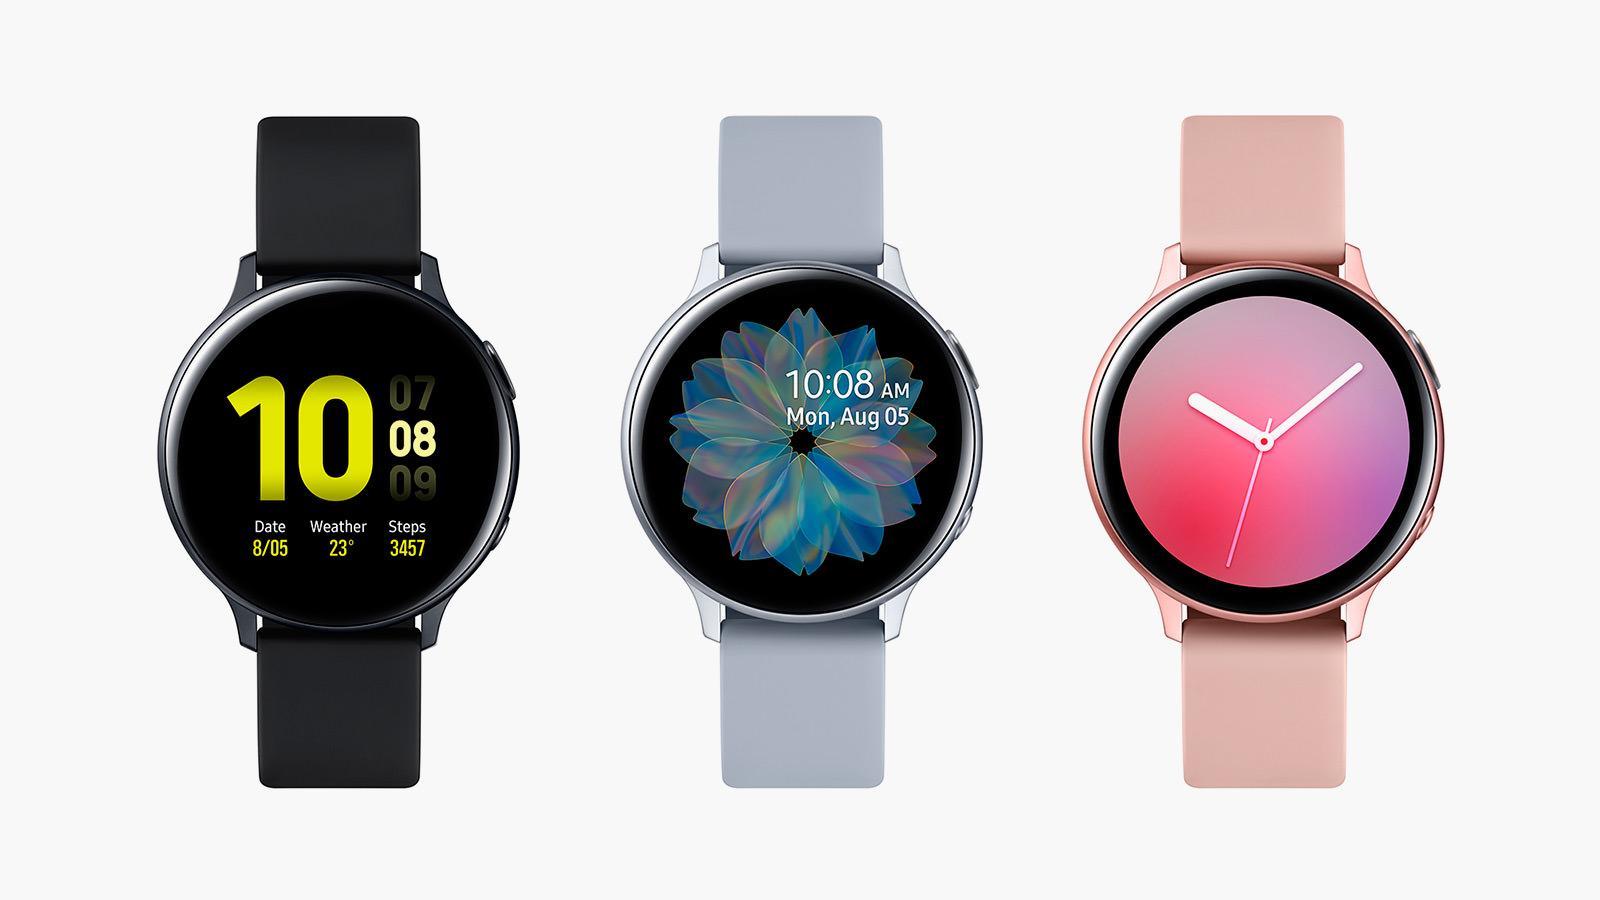 Tech, Gear, Samsung, Galaxy Watch, Galaxy Watch Active2